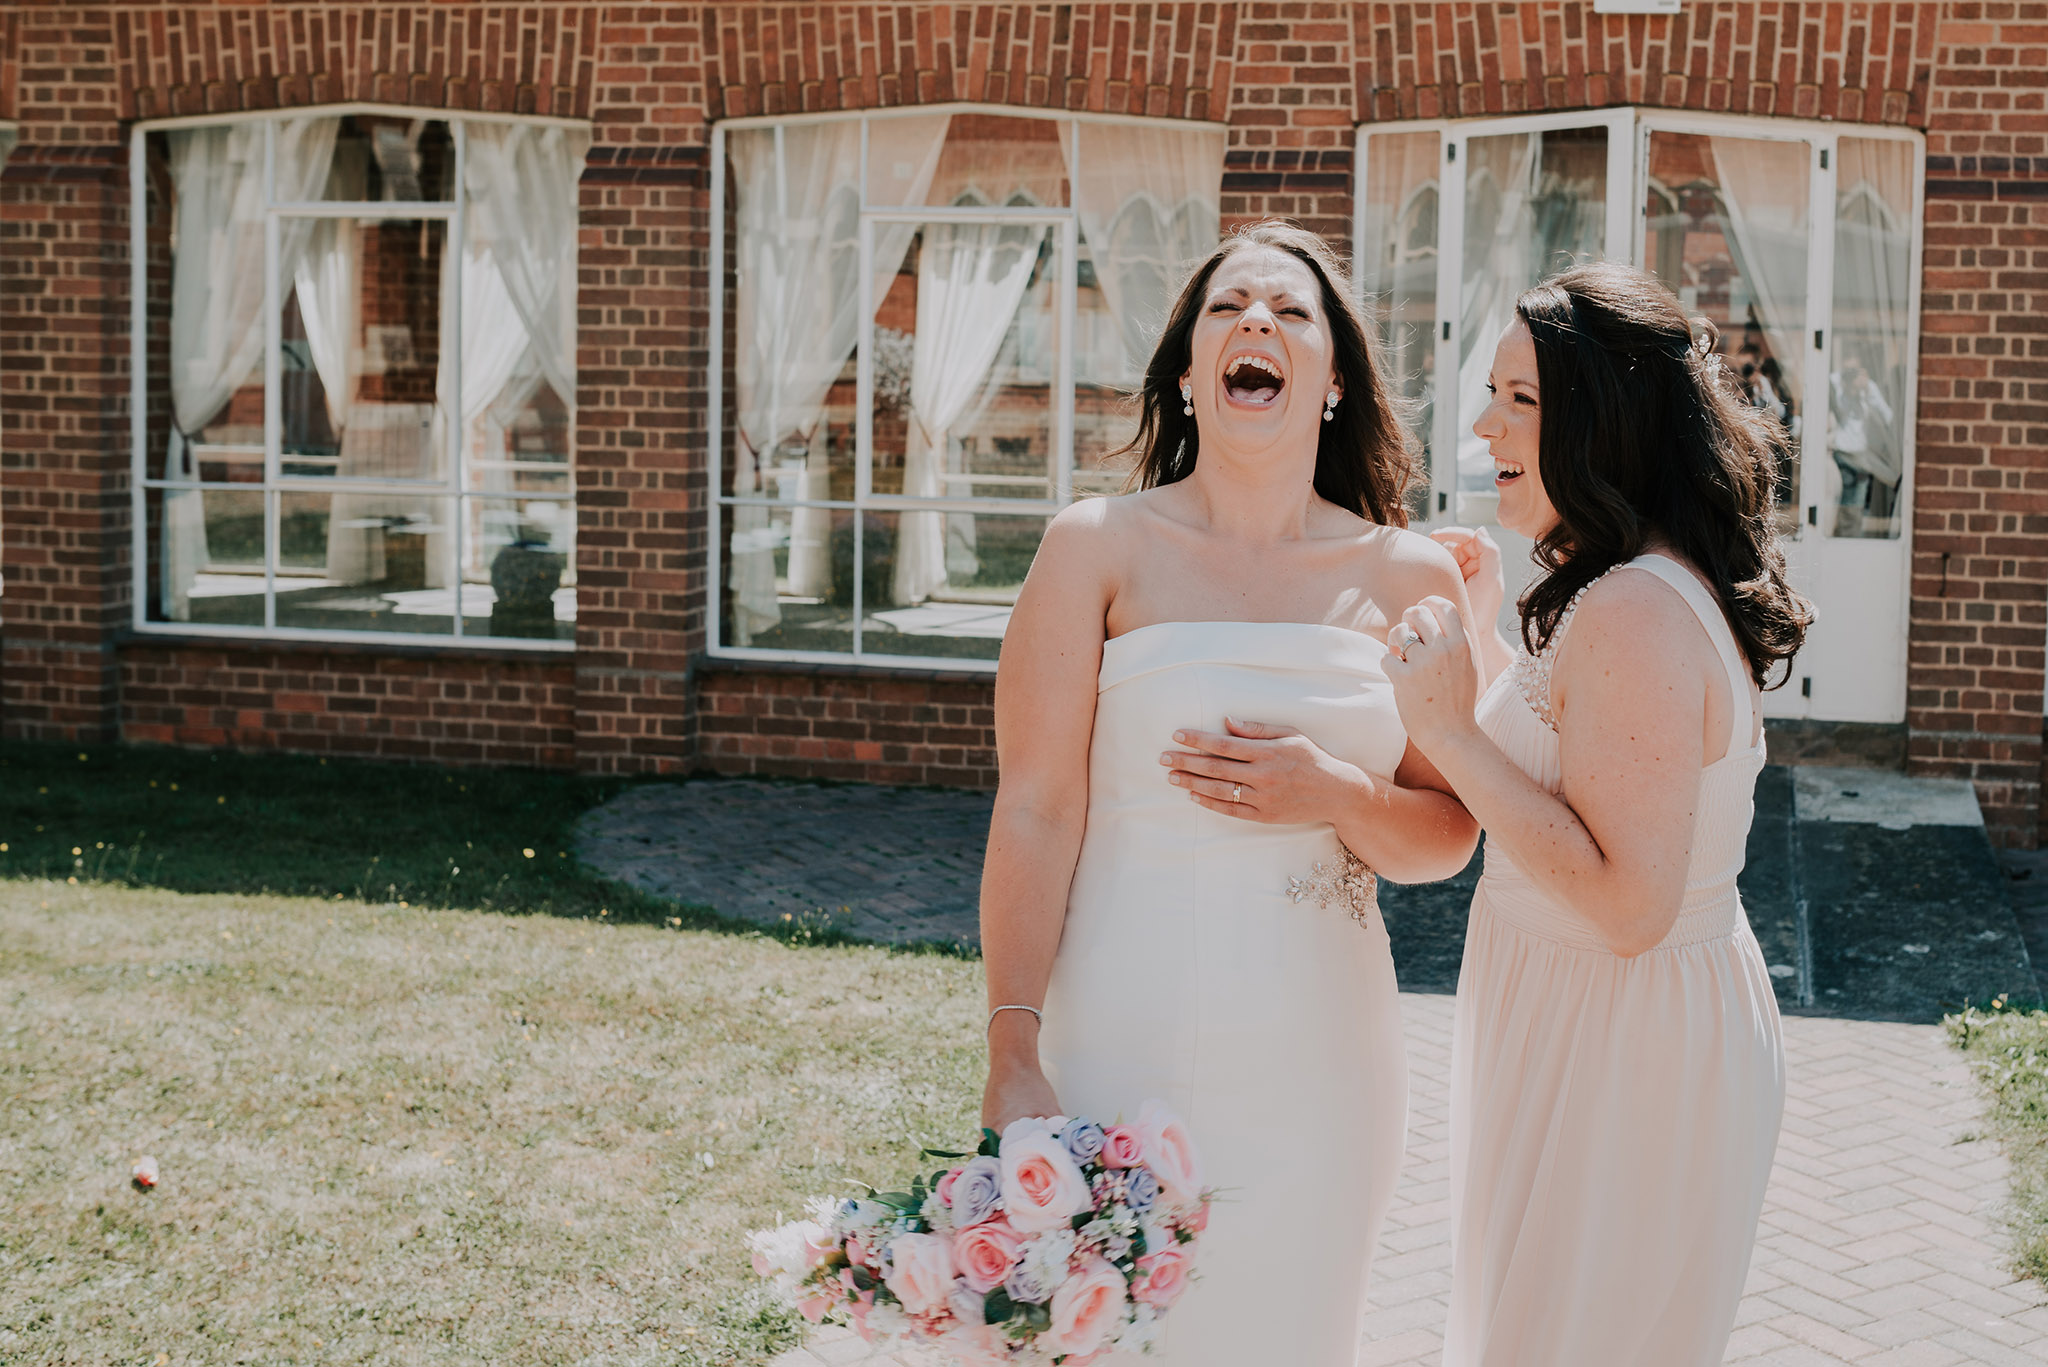 scott-stockwell-photography-wedding-22.jpg